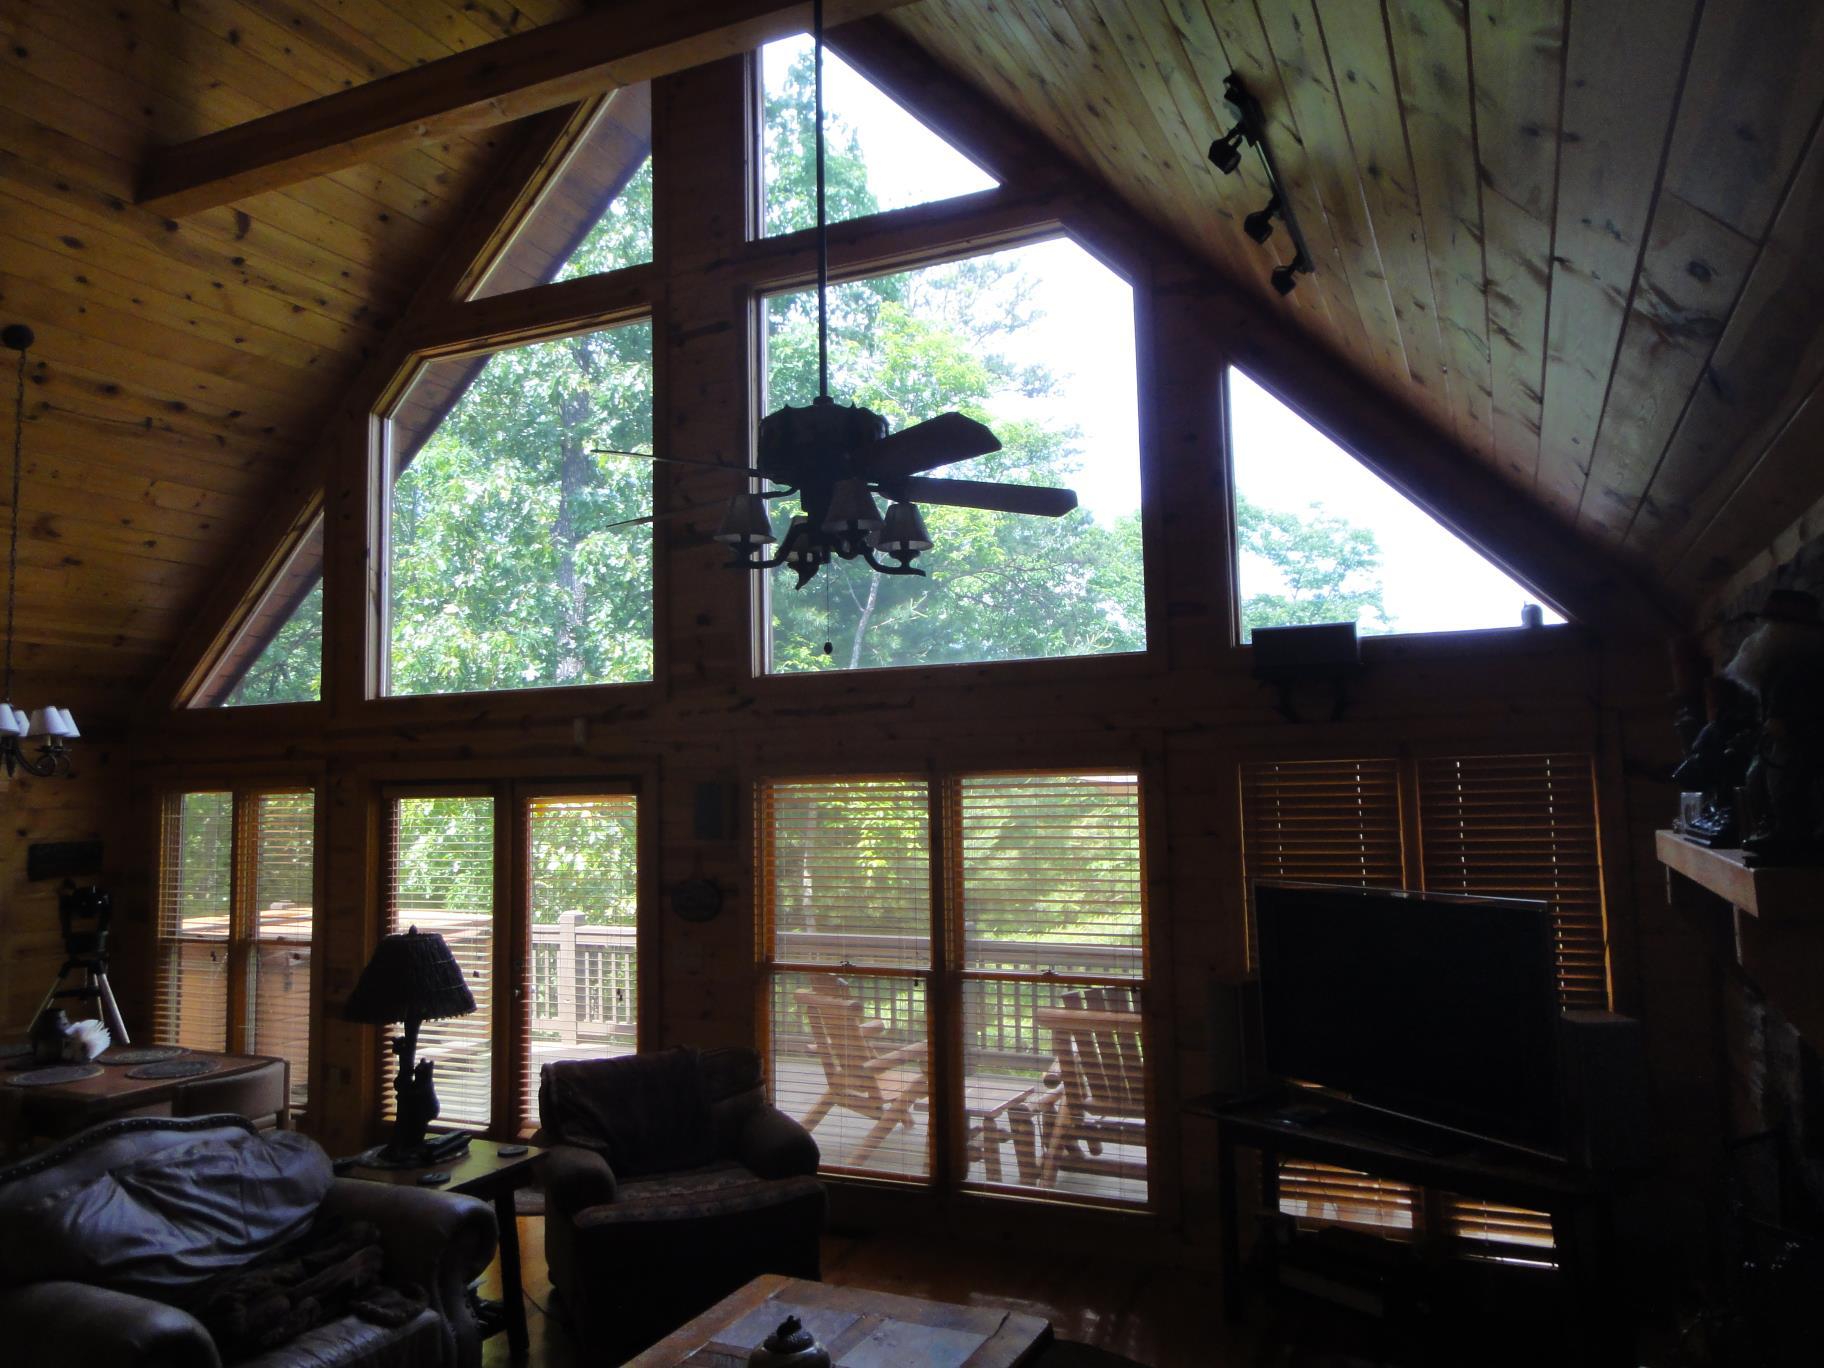 house-window-tinting-privacy-film-hornsby-turramurra-waitara